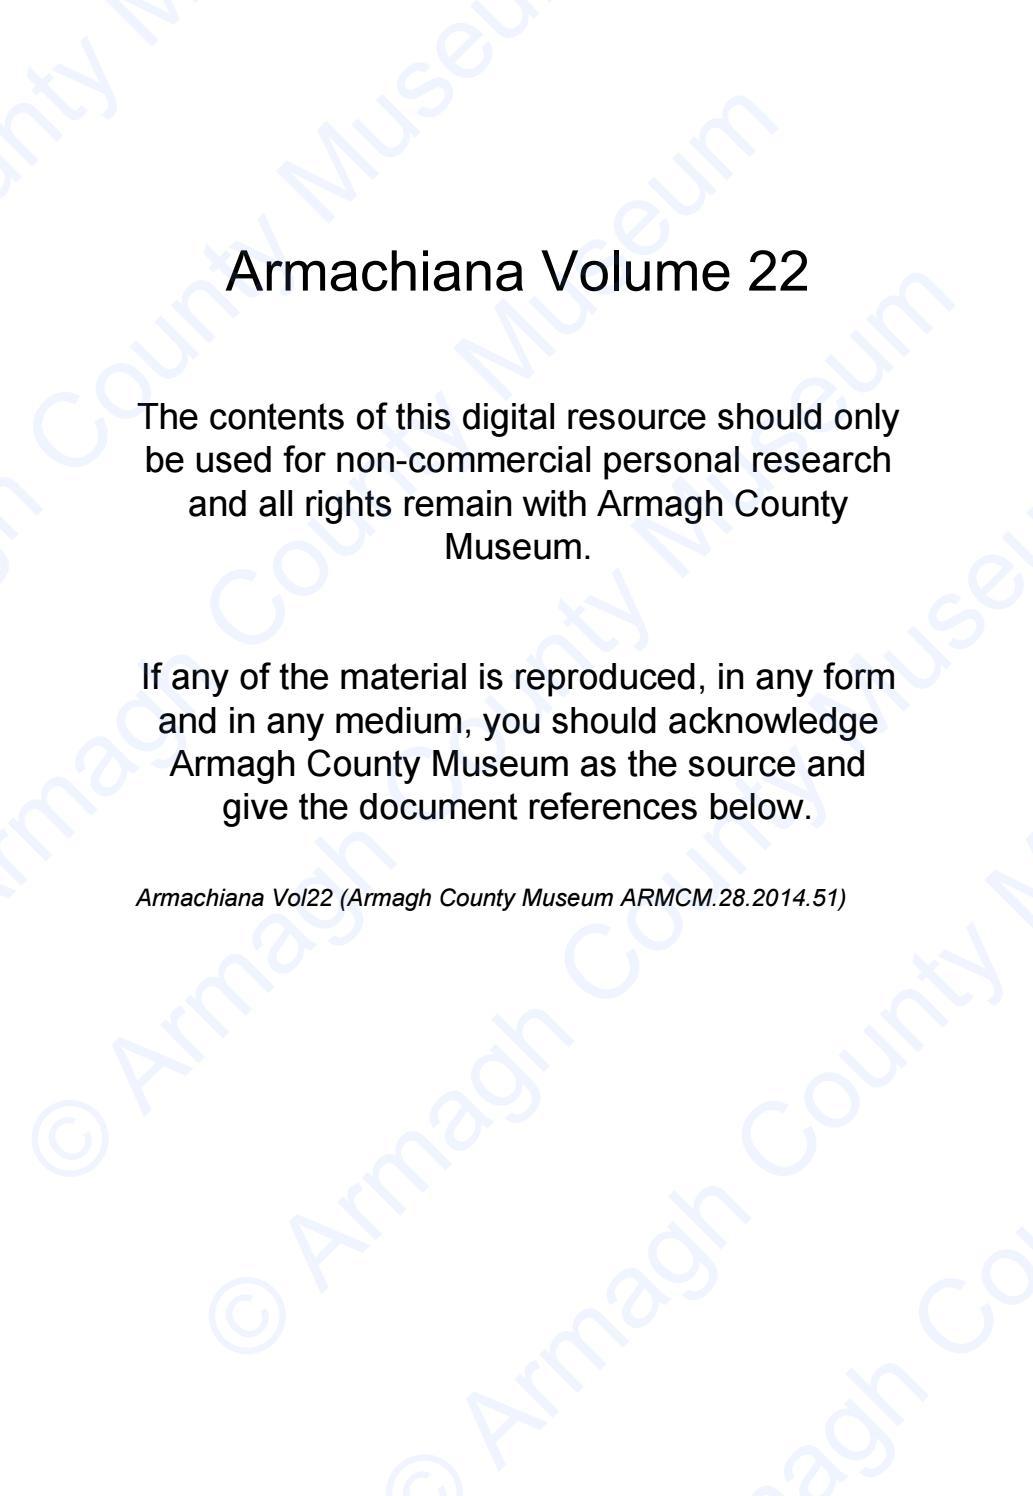 Armachiana Volume 22 By Armagh City Banbridge Craigavon Borough Council Issuu